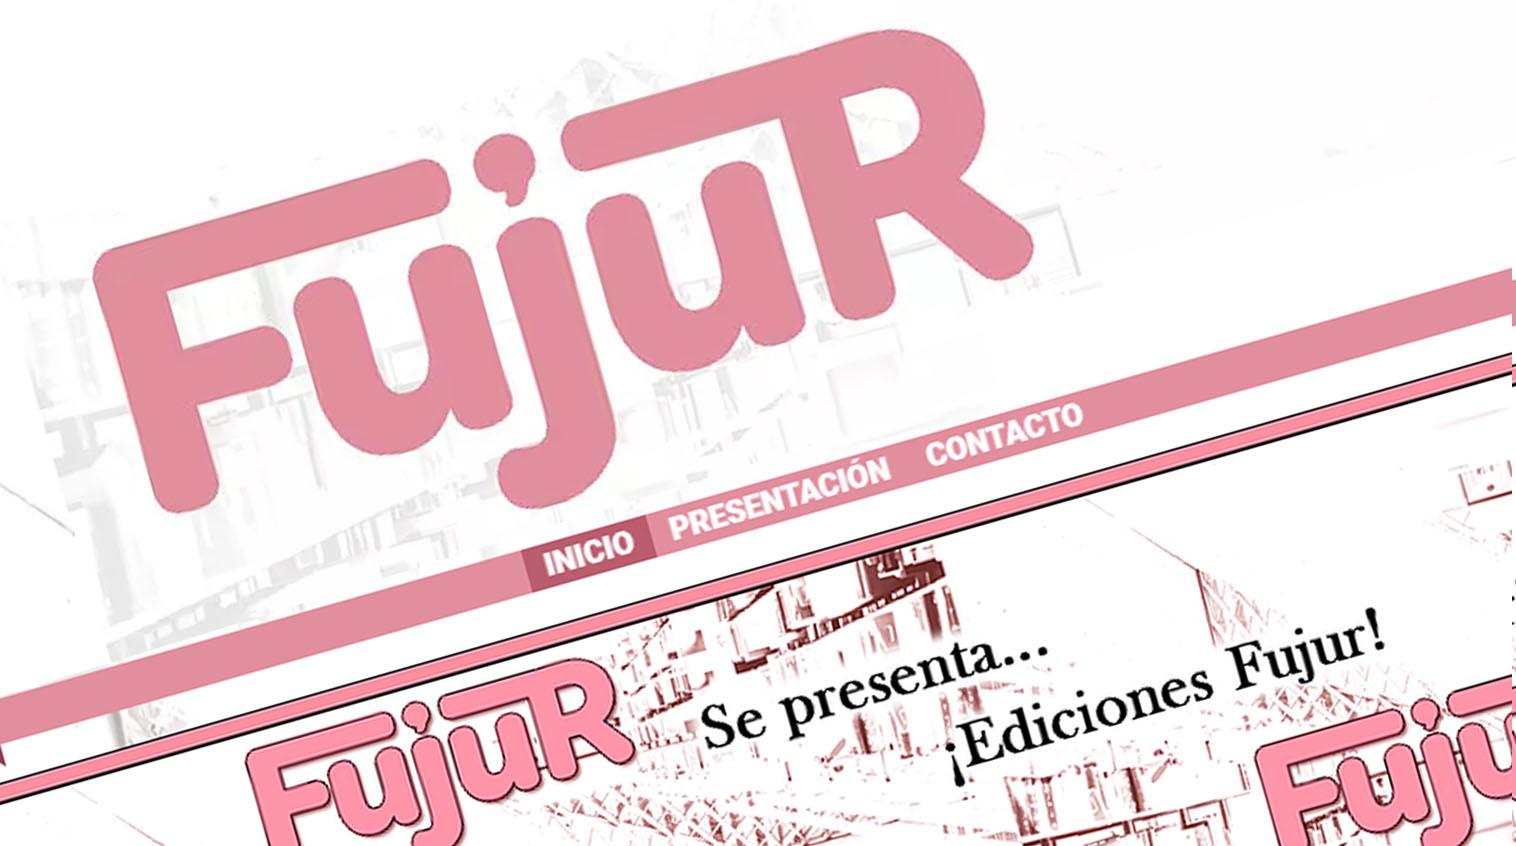 fujur-banner.jpg